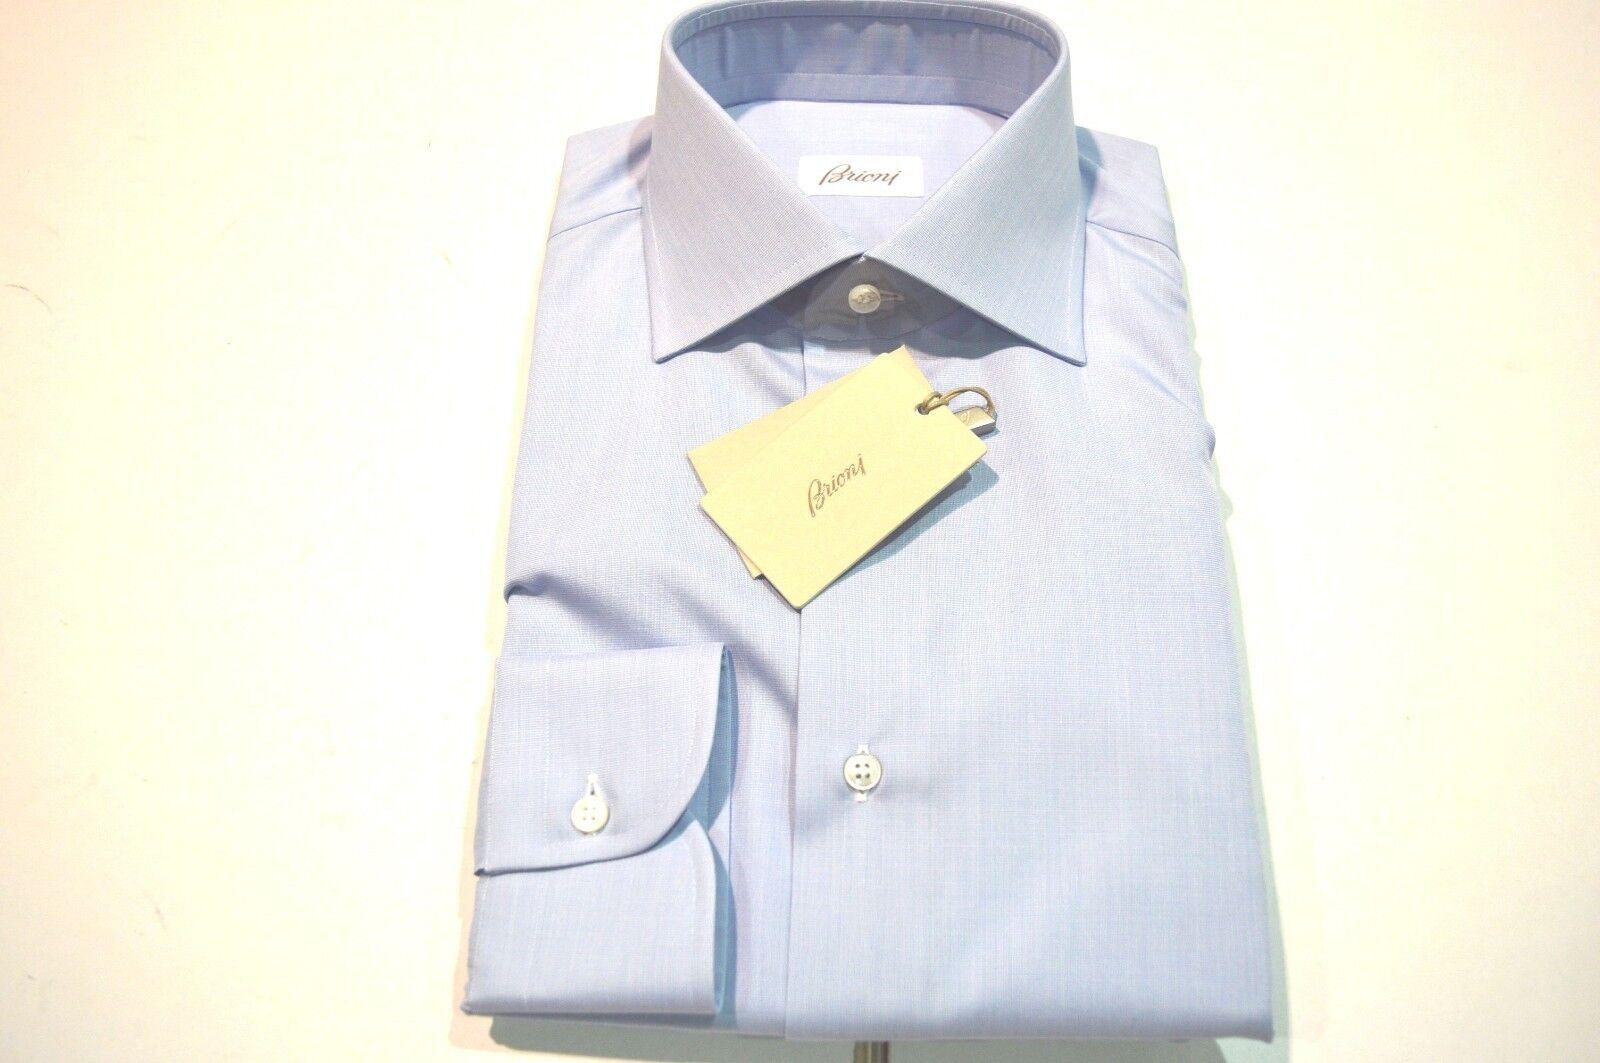 NEW  BRIONI Dress SHIRT 100% Cotton Size 16 Us 41 Eu  (Store Code SE24)